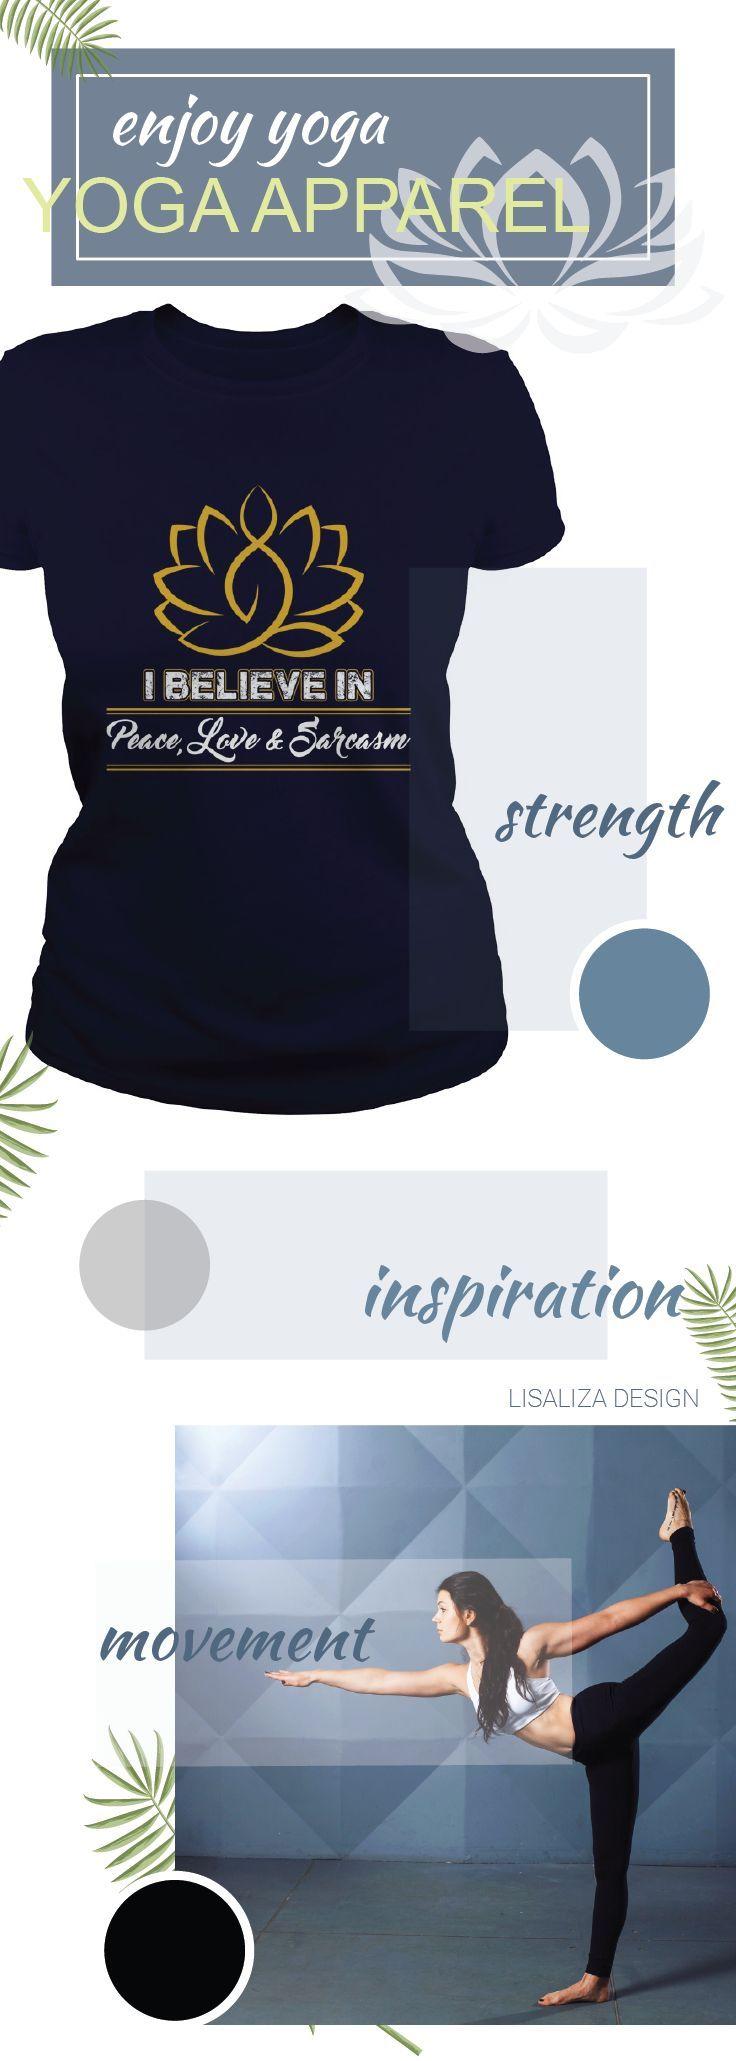 Yoga Love Shirt- I Believe In Peace, Love and Sarcasm Women Yoga TShirt / Ladies Tee.   #Fitness #Exercise #yoga # #yogadesign #chakra #yogalover #energy #inspiration #yogacasual #workout #inhale #exhale #breathe #meditation #women #fashion #Sunfrog #Lisaliza #giftideas #health #lifestyle